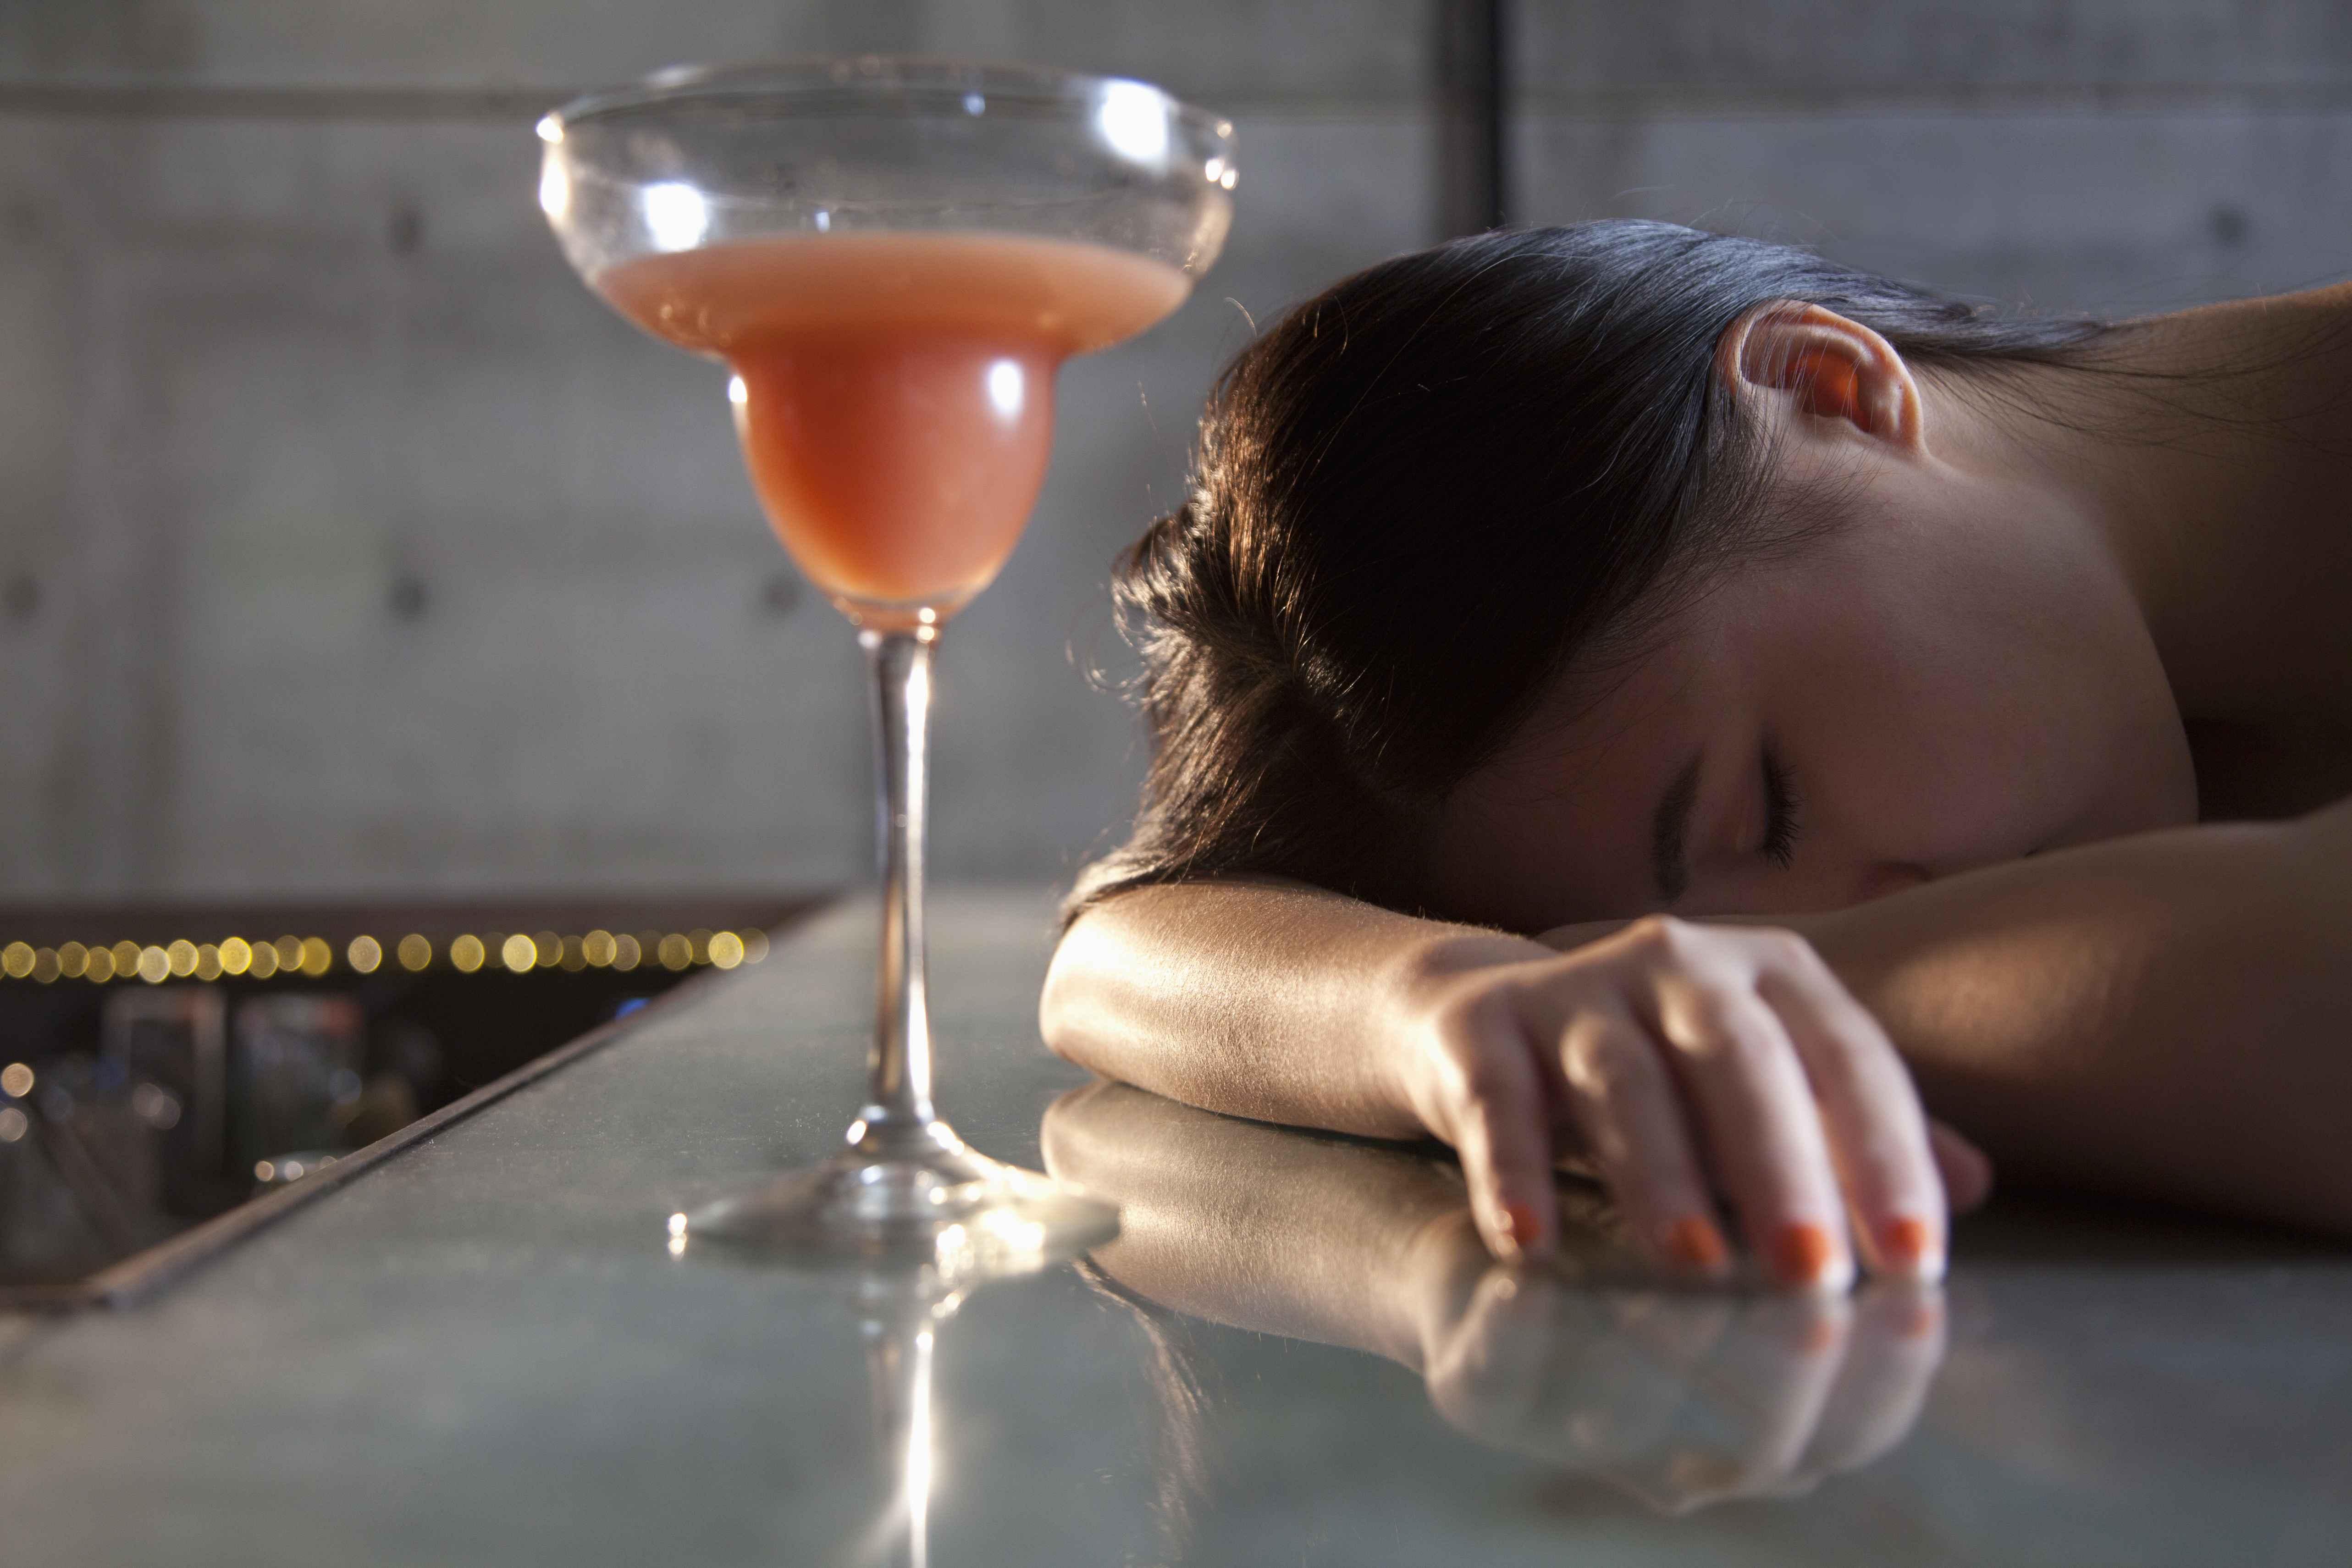 Binge drinking adolescenziale /